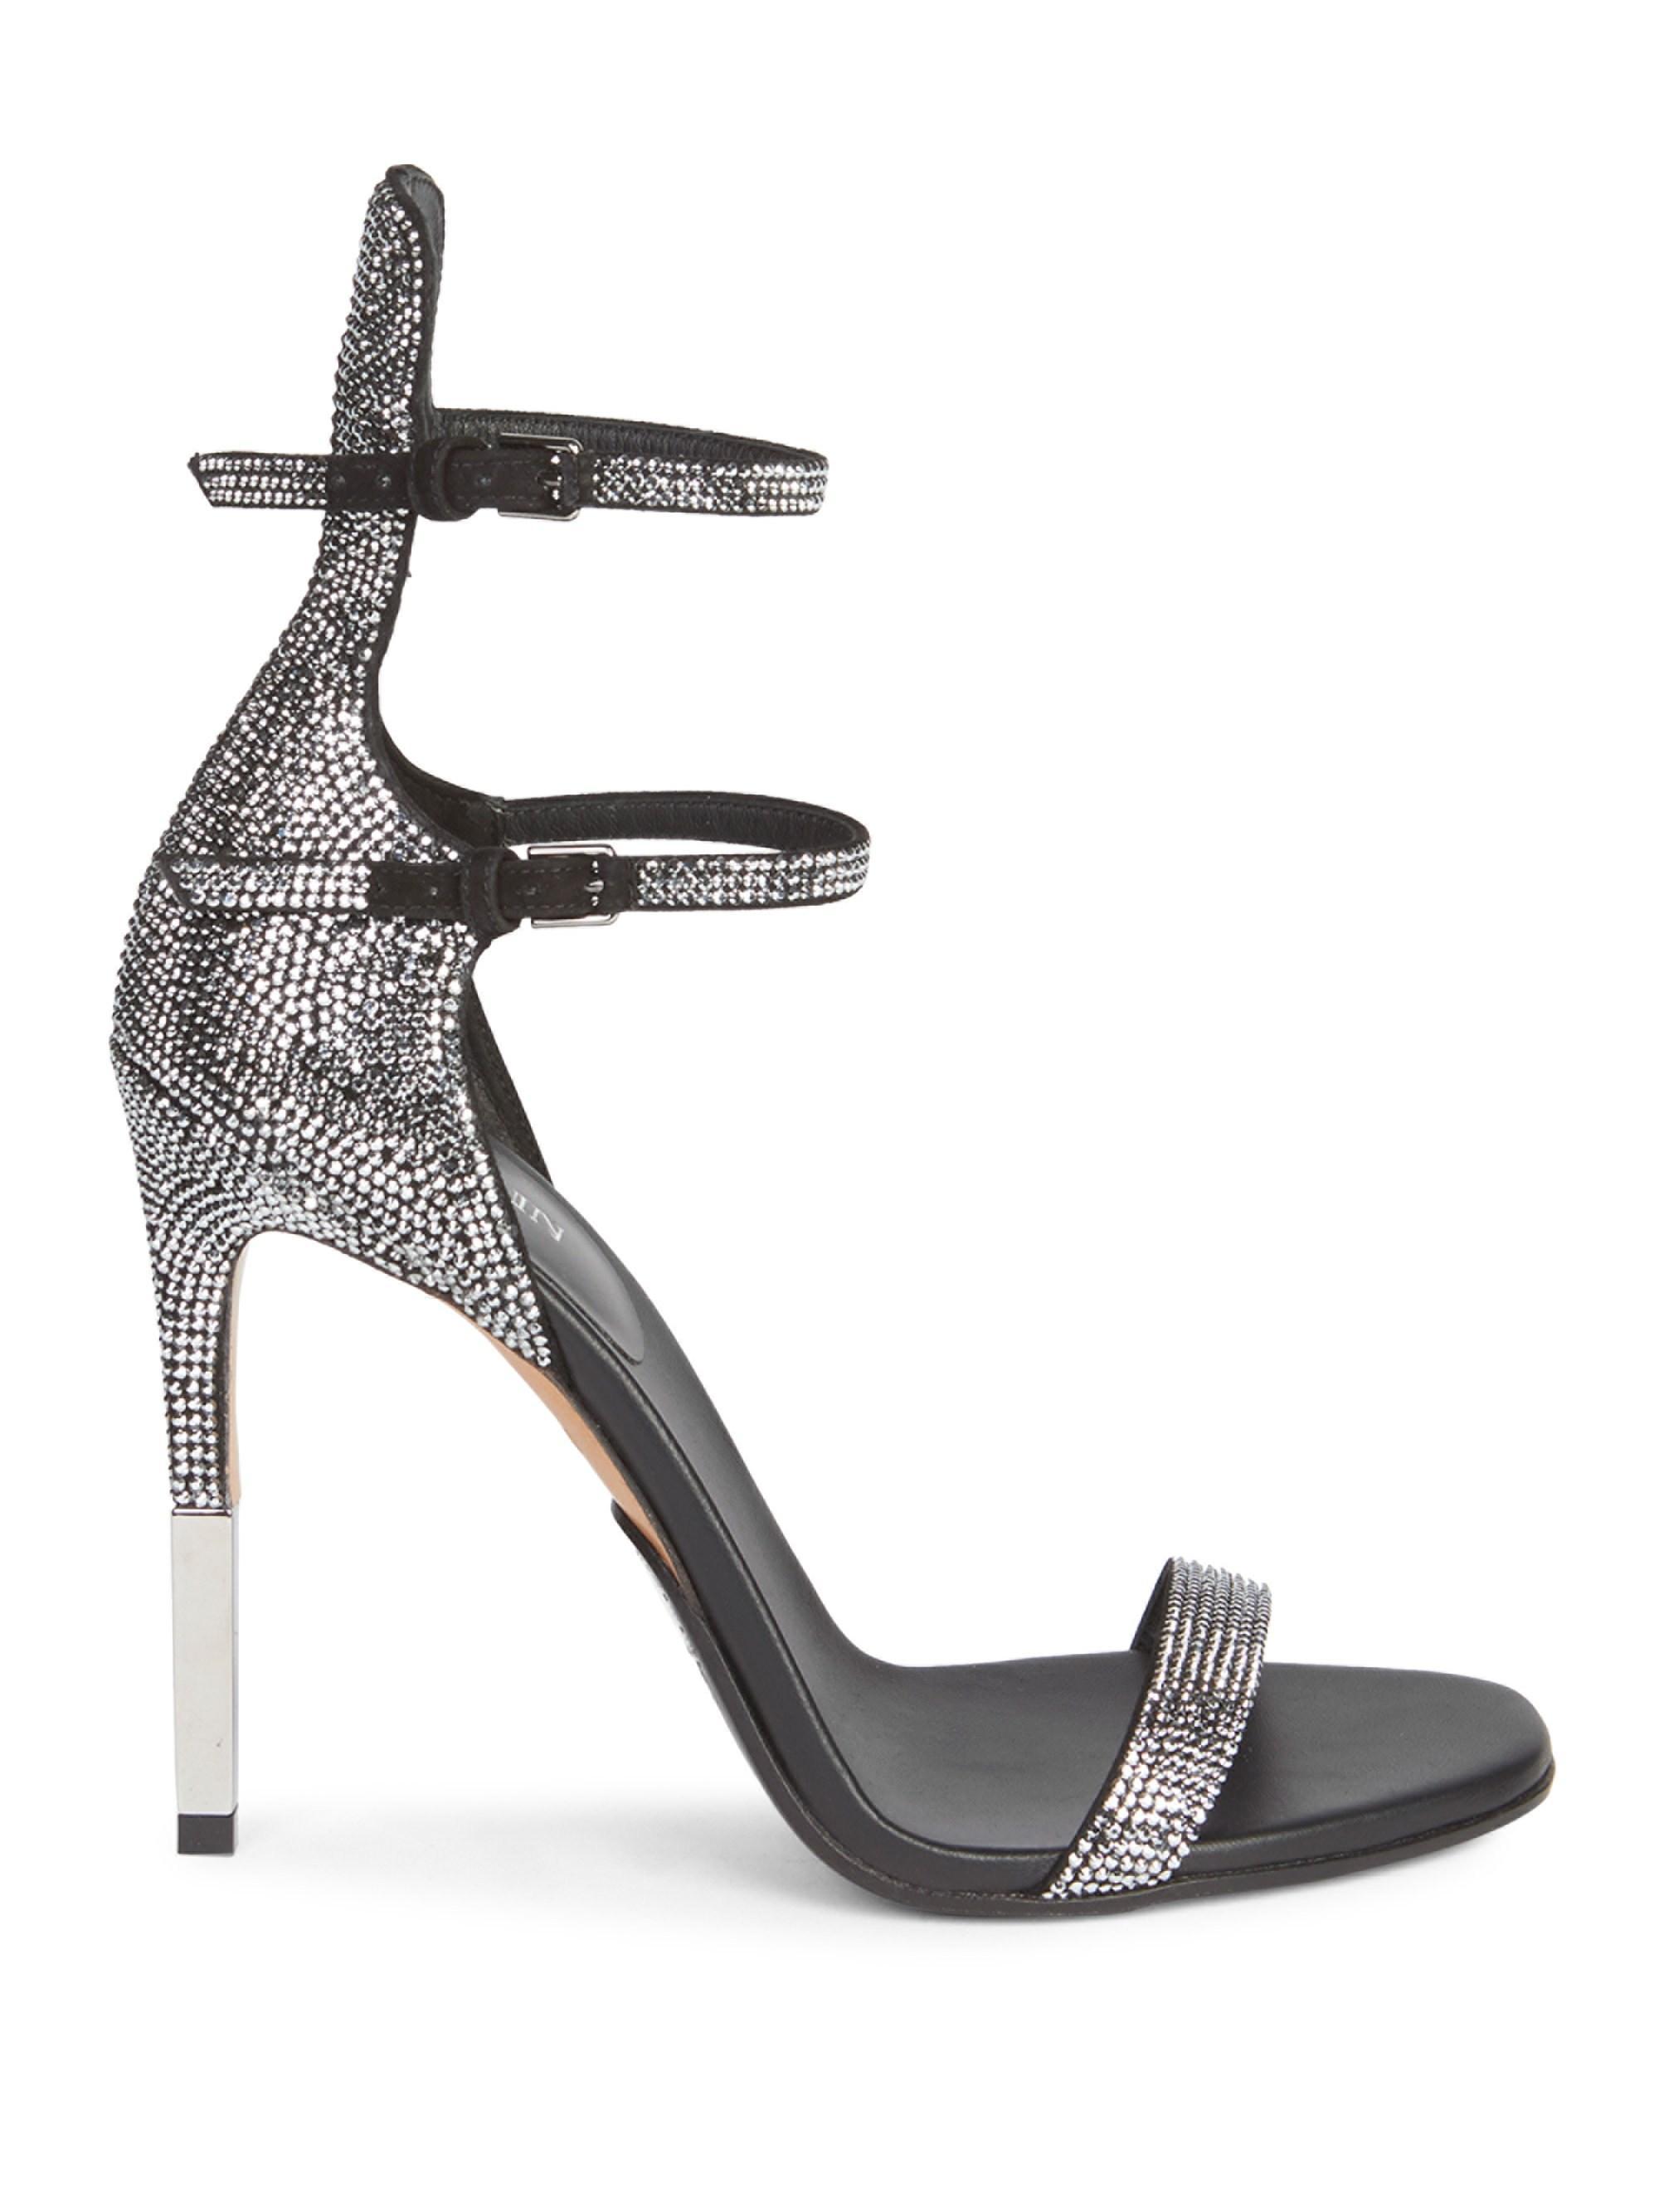 95e1f8da43177e Lyst - Balmain Elvira Strass Rhinestone Sandals in Black